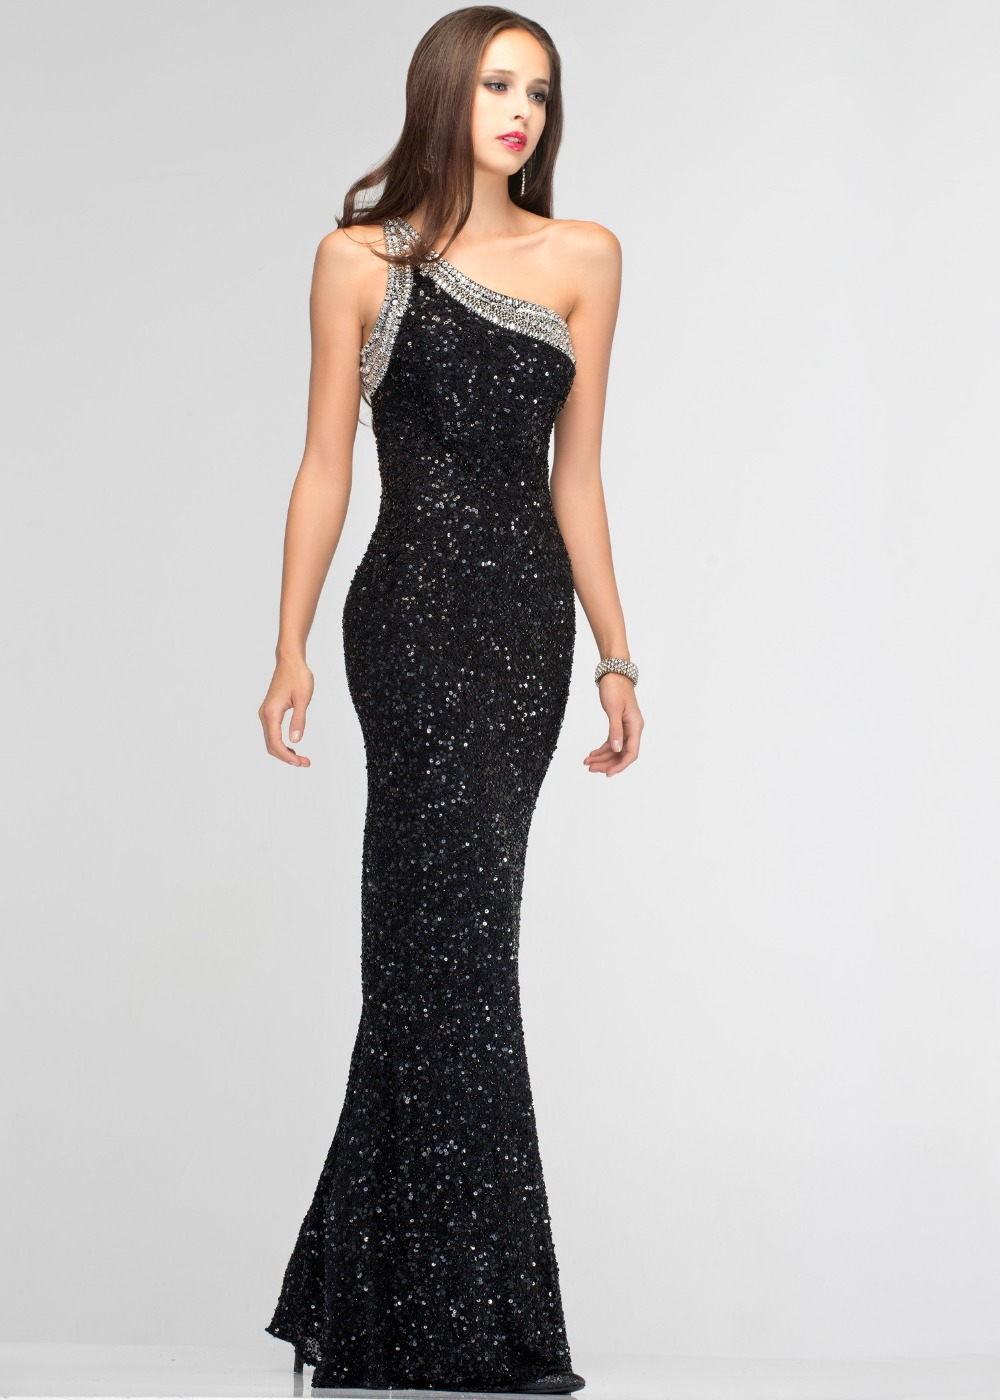 prom sequin Black dress long